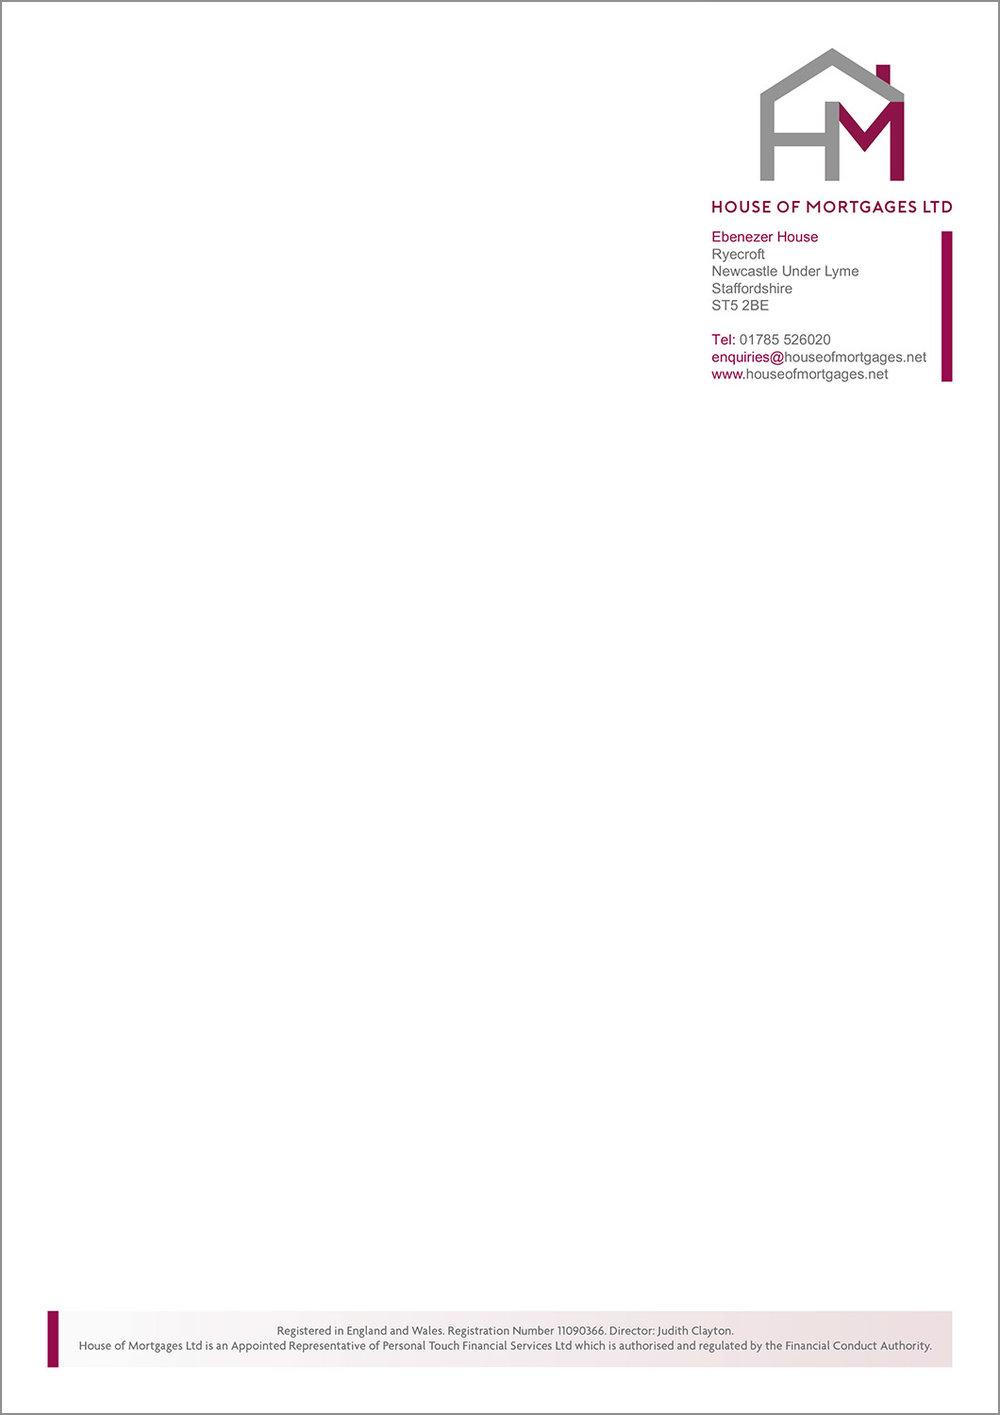 HOM-Letterhead-graphic-design-branding-gloucestershire-1500pxl.jpg